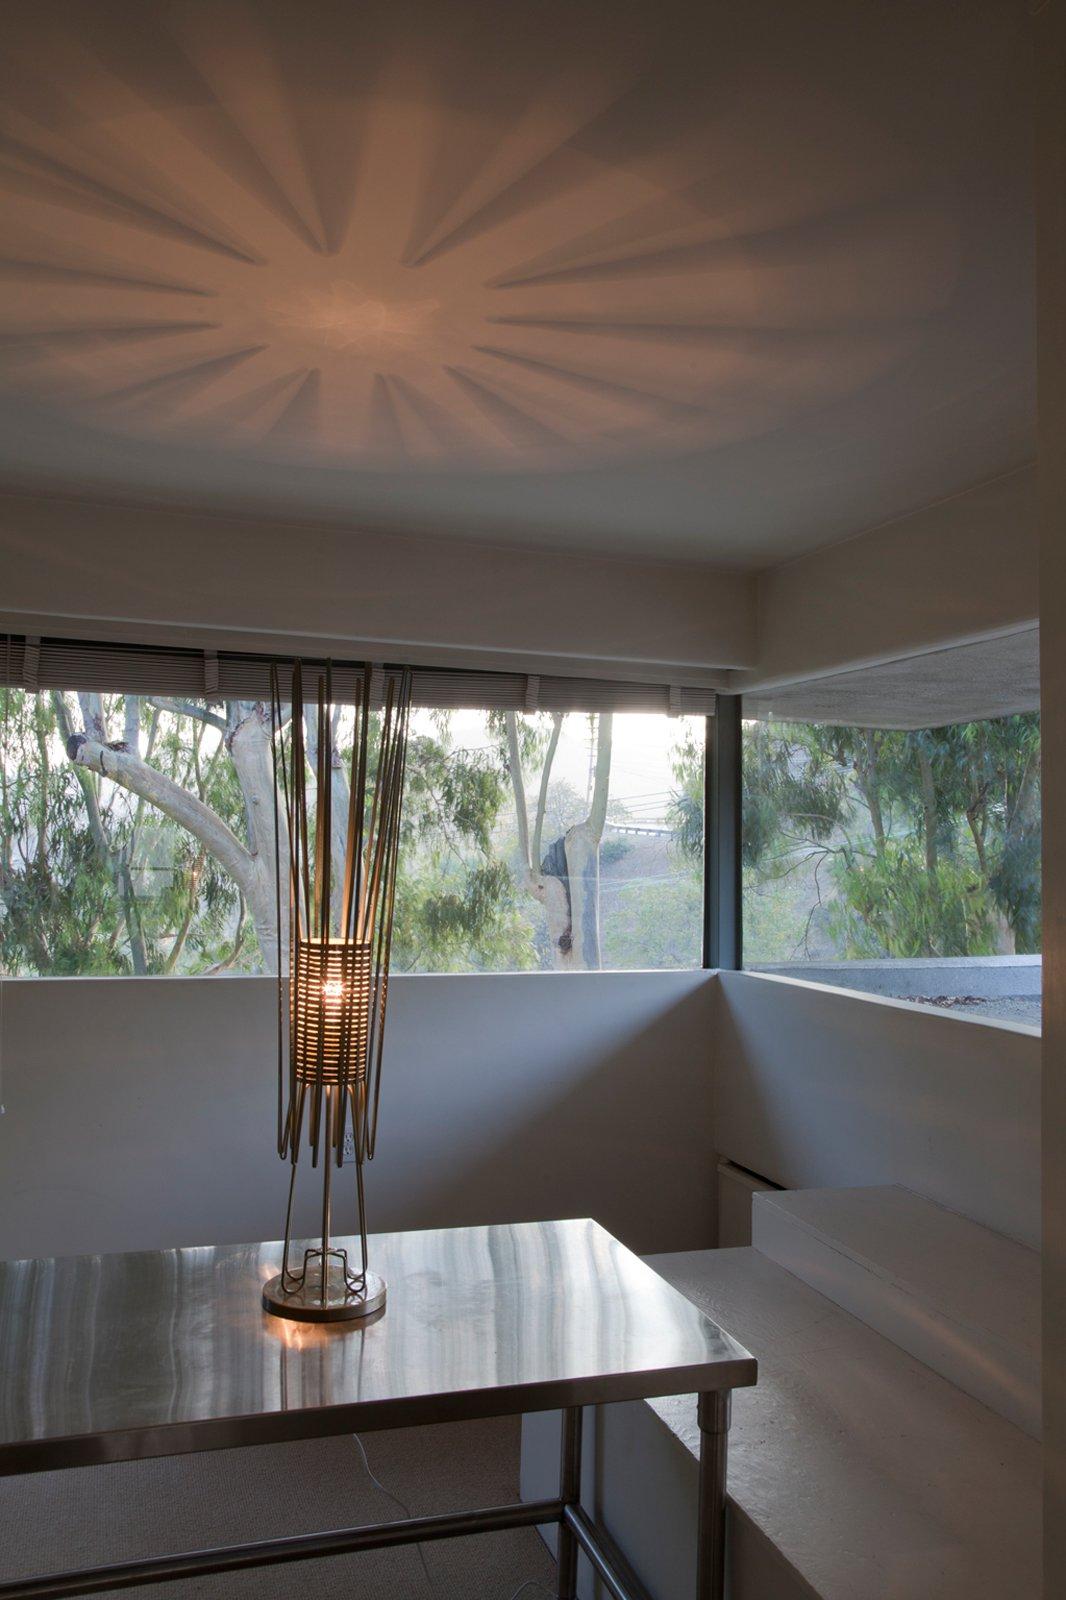 Chu Gooding Architects, Untitled  Photo by: Patricia Parinejad  Photo 9 of 15 in Light My Way, Stranger